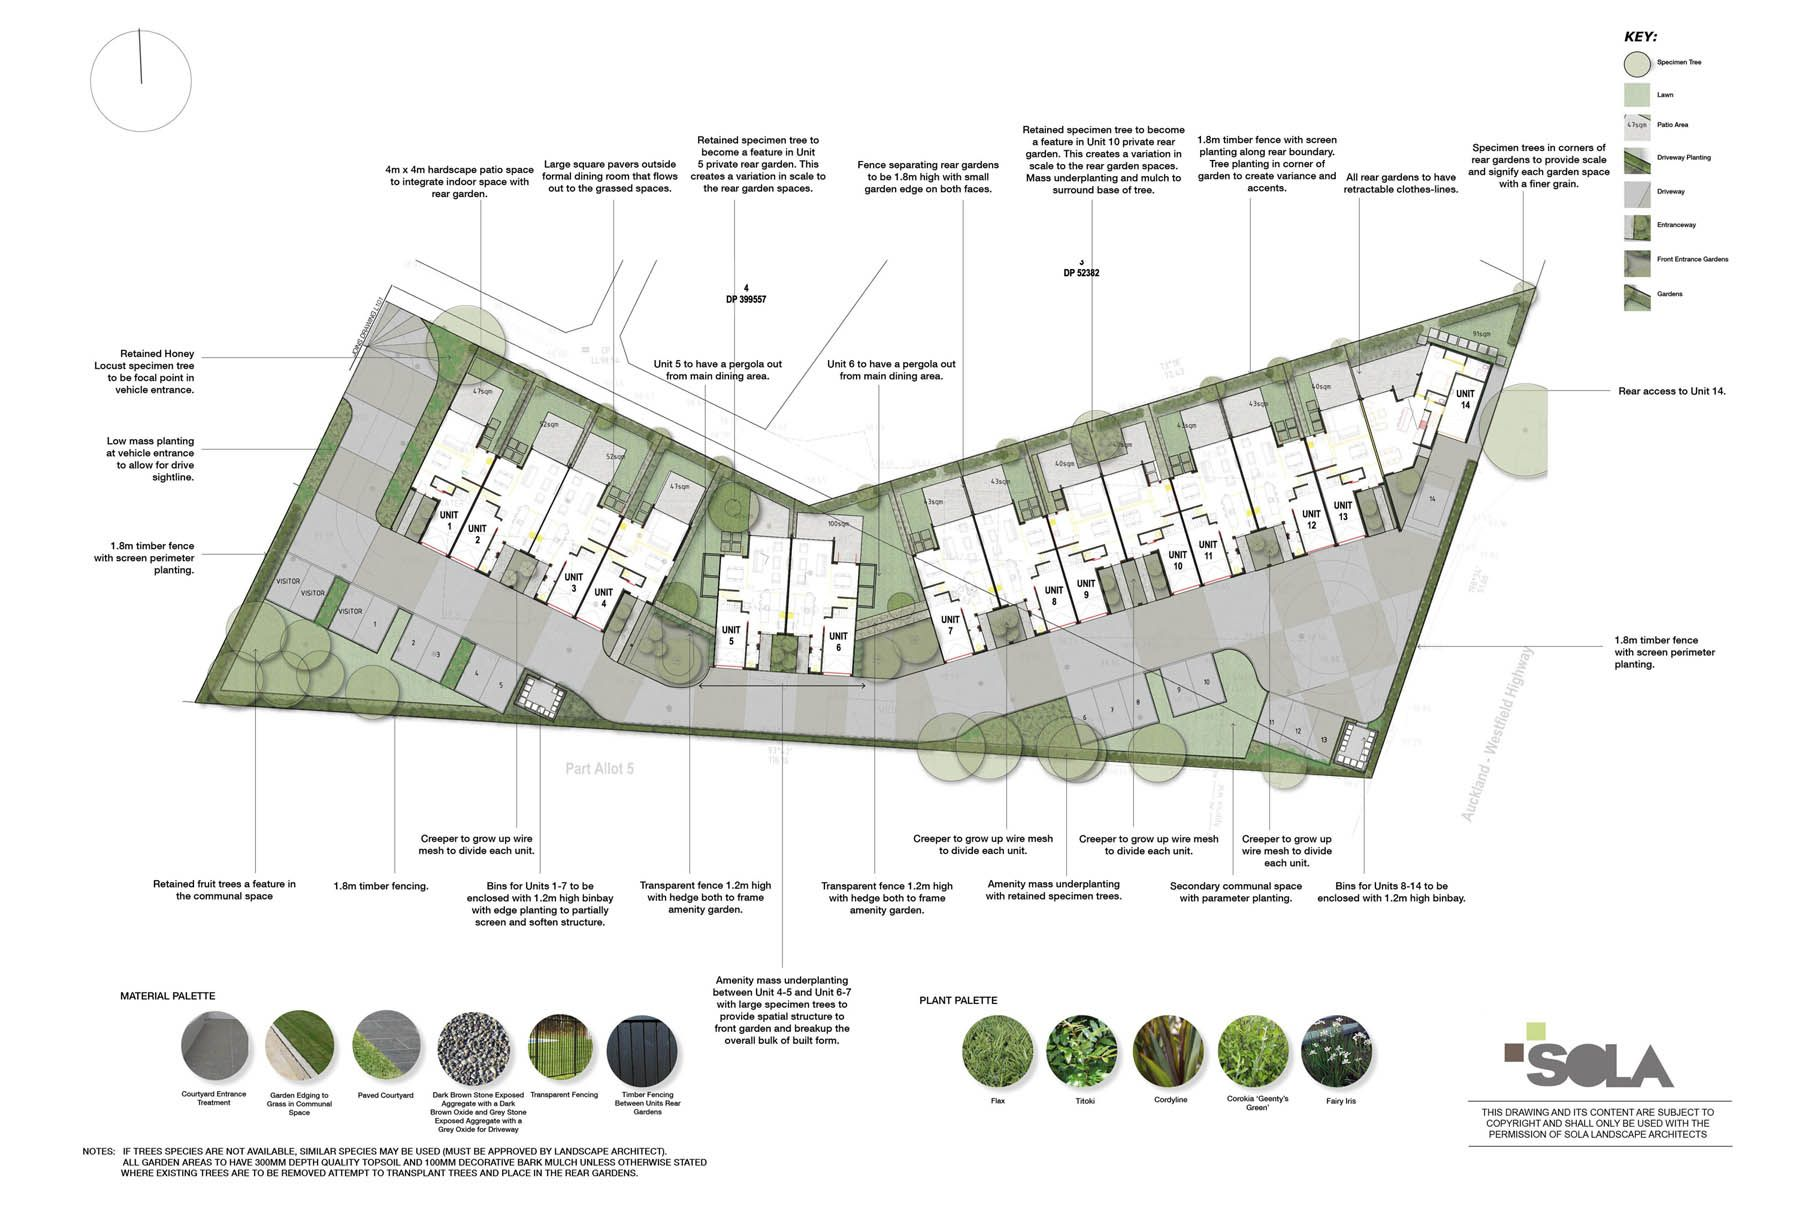 SOLA Landscape Architecture Auckland (With images